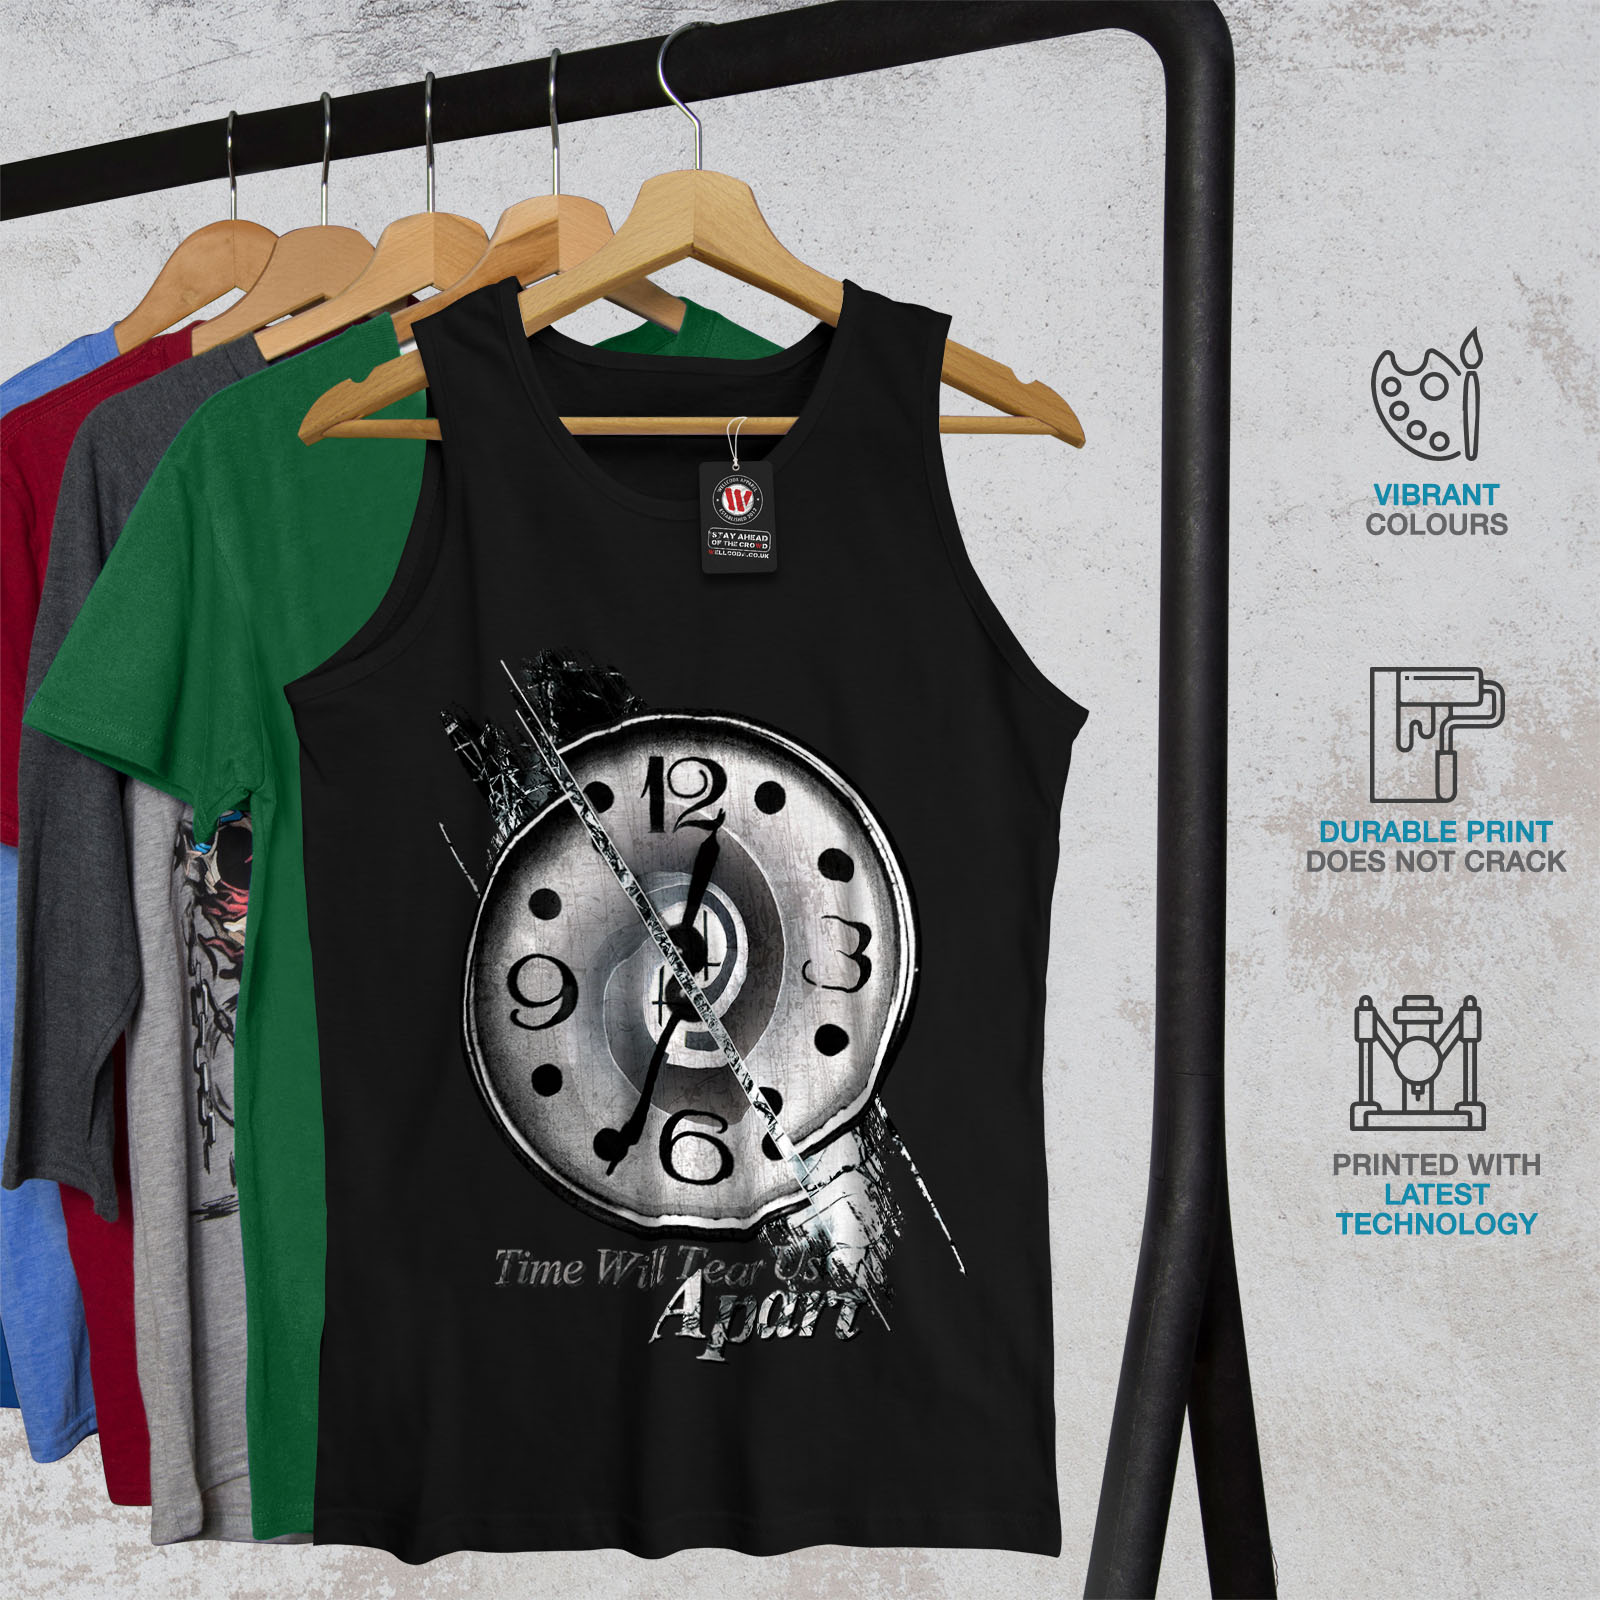 Wellcoda-Clock-Stylish-Art-Mens-Tank-Top-Split-Active-Sports-Shirt thumbnail 4